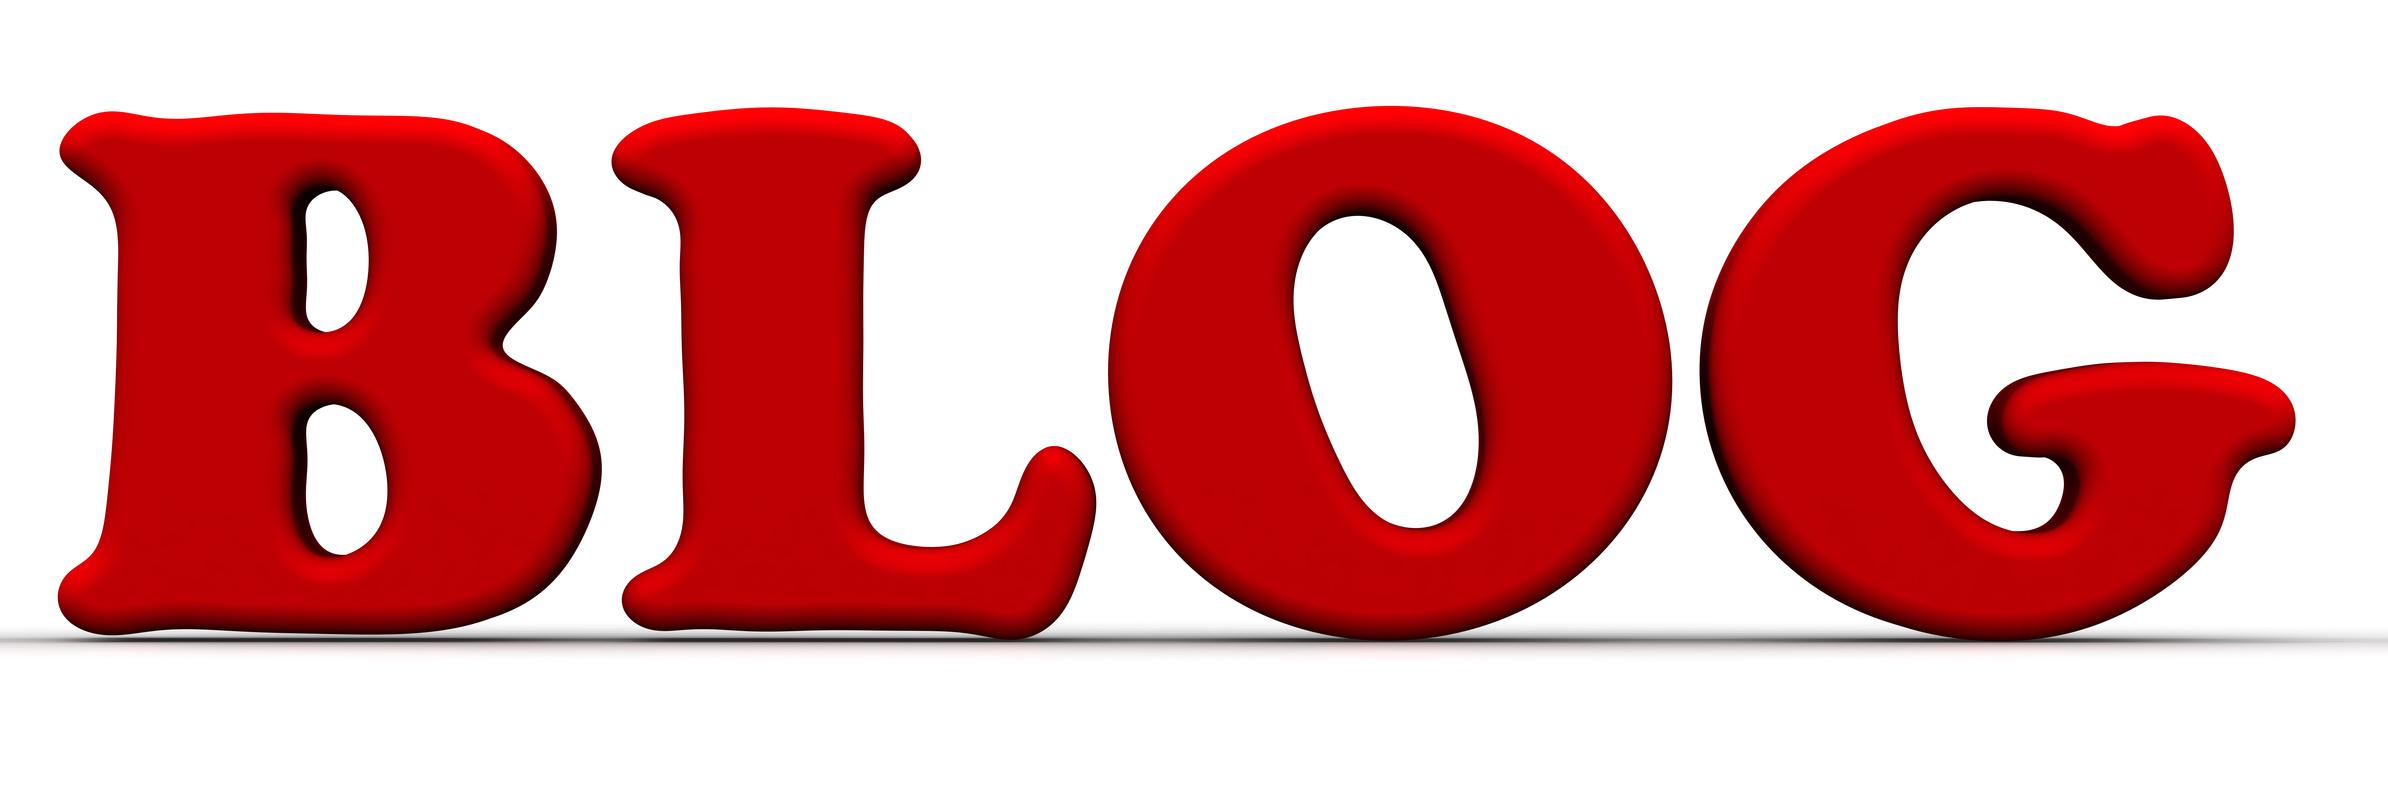 Blog (блог). Красное слово на белом фоне